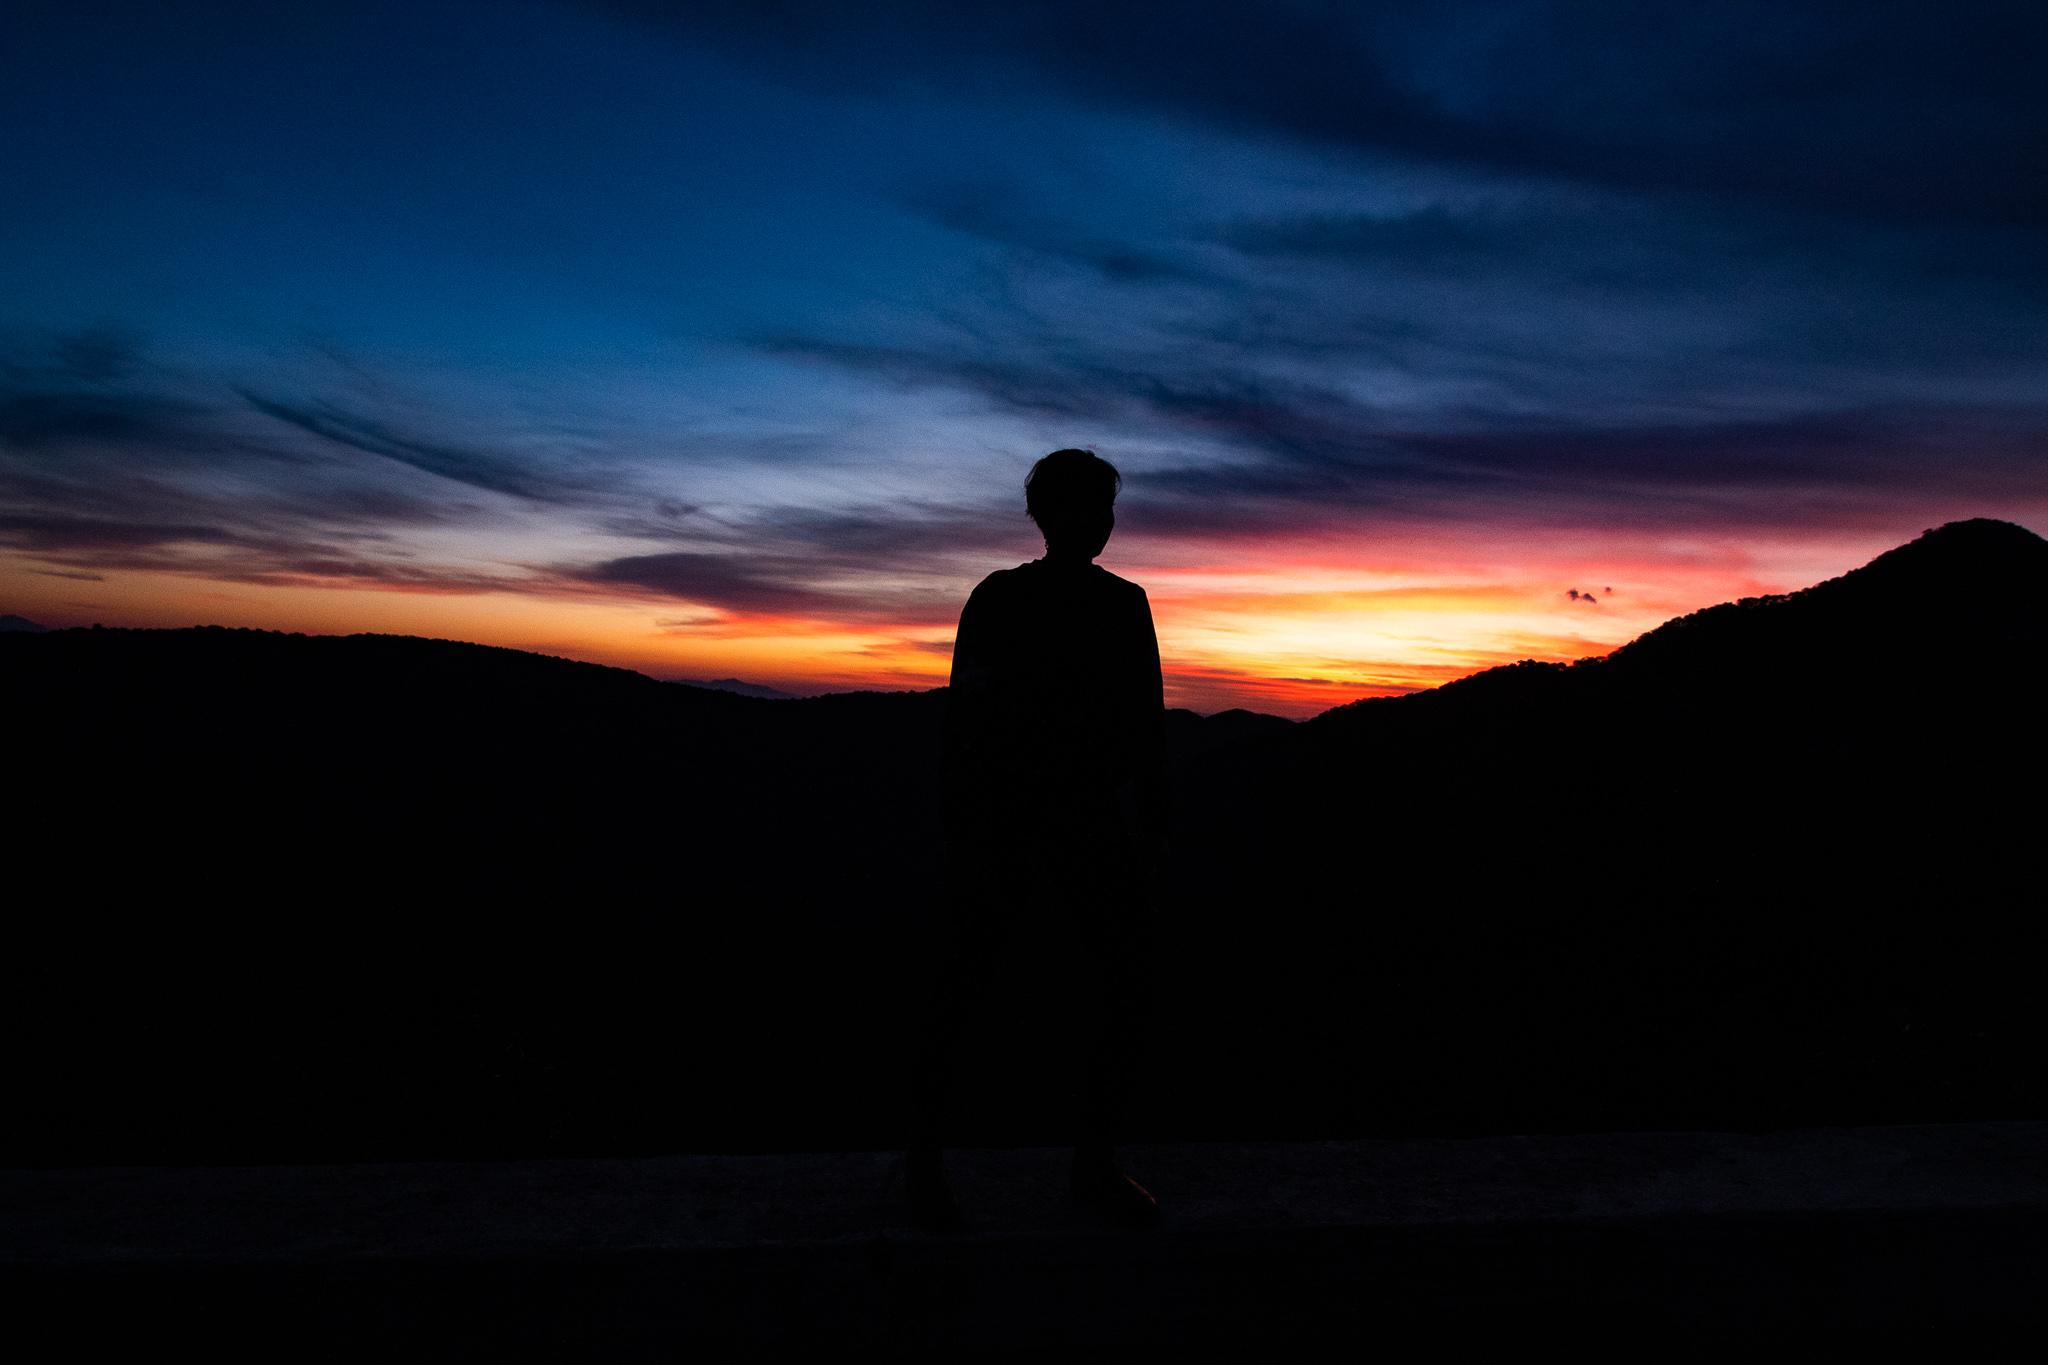 Sunrise in the Sierra Gorda